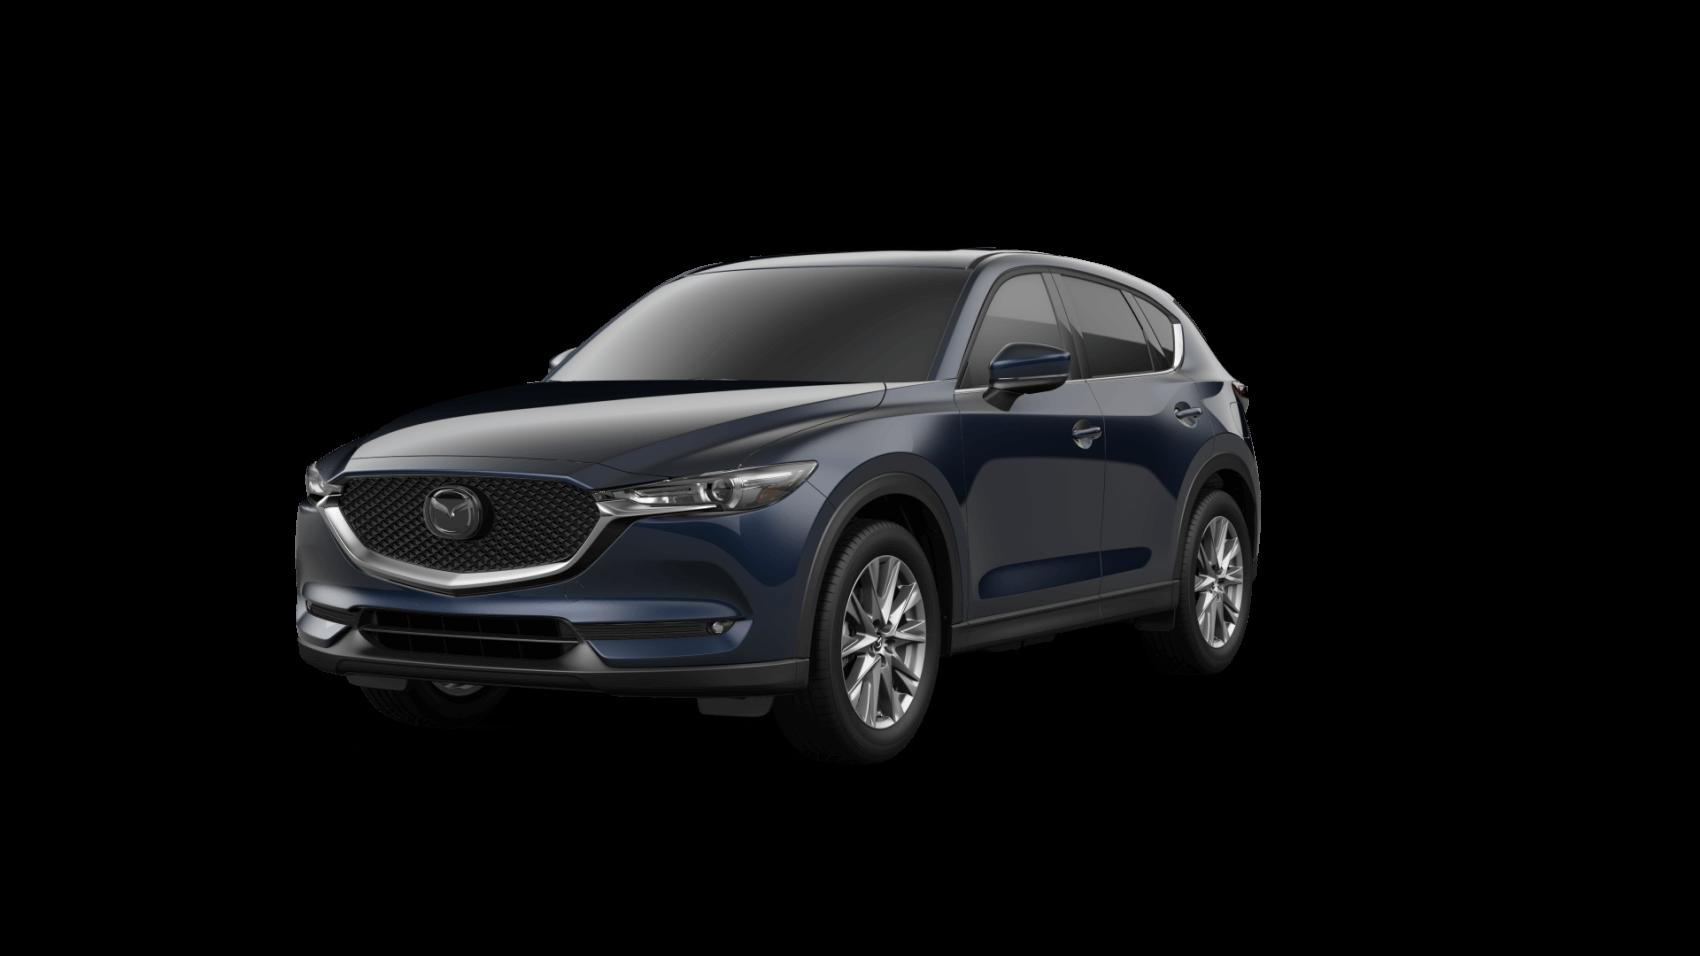 2021 Mazda CX-5 Grand Touring Reserve Deep Crystal Blue Ocean Mazda